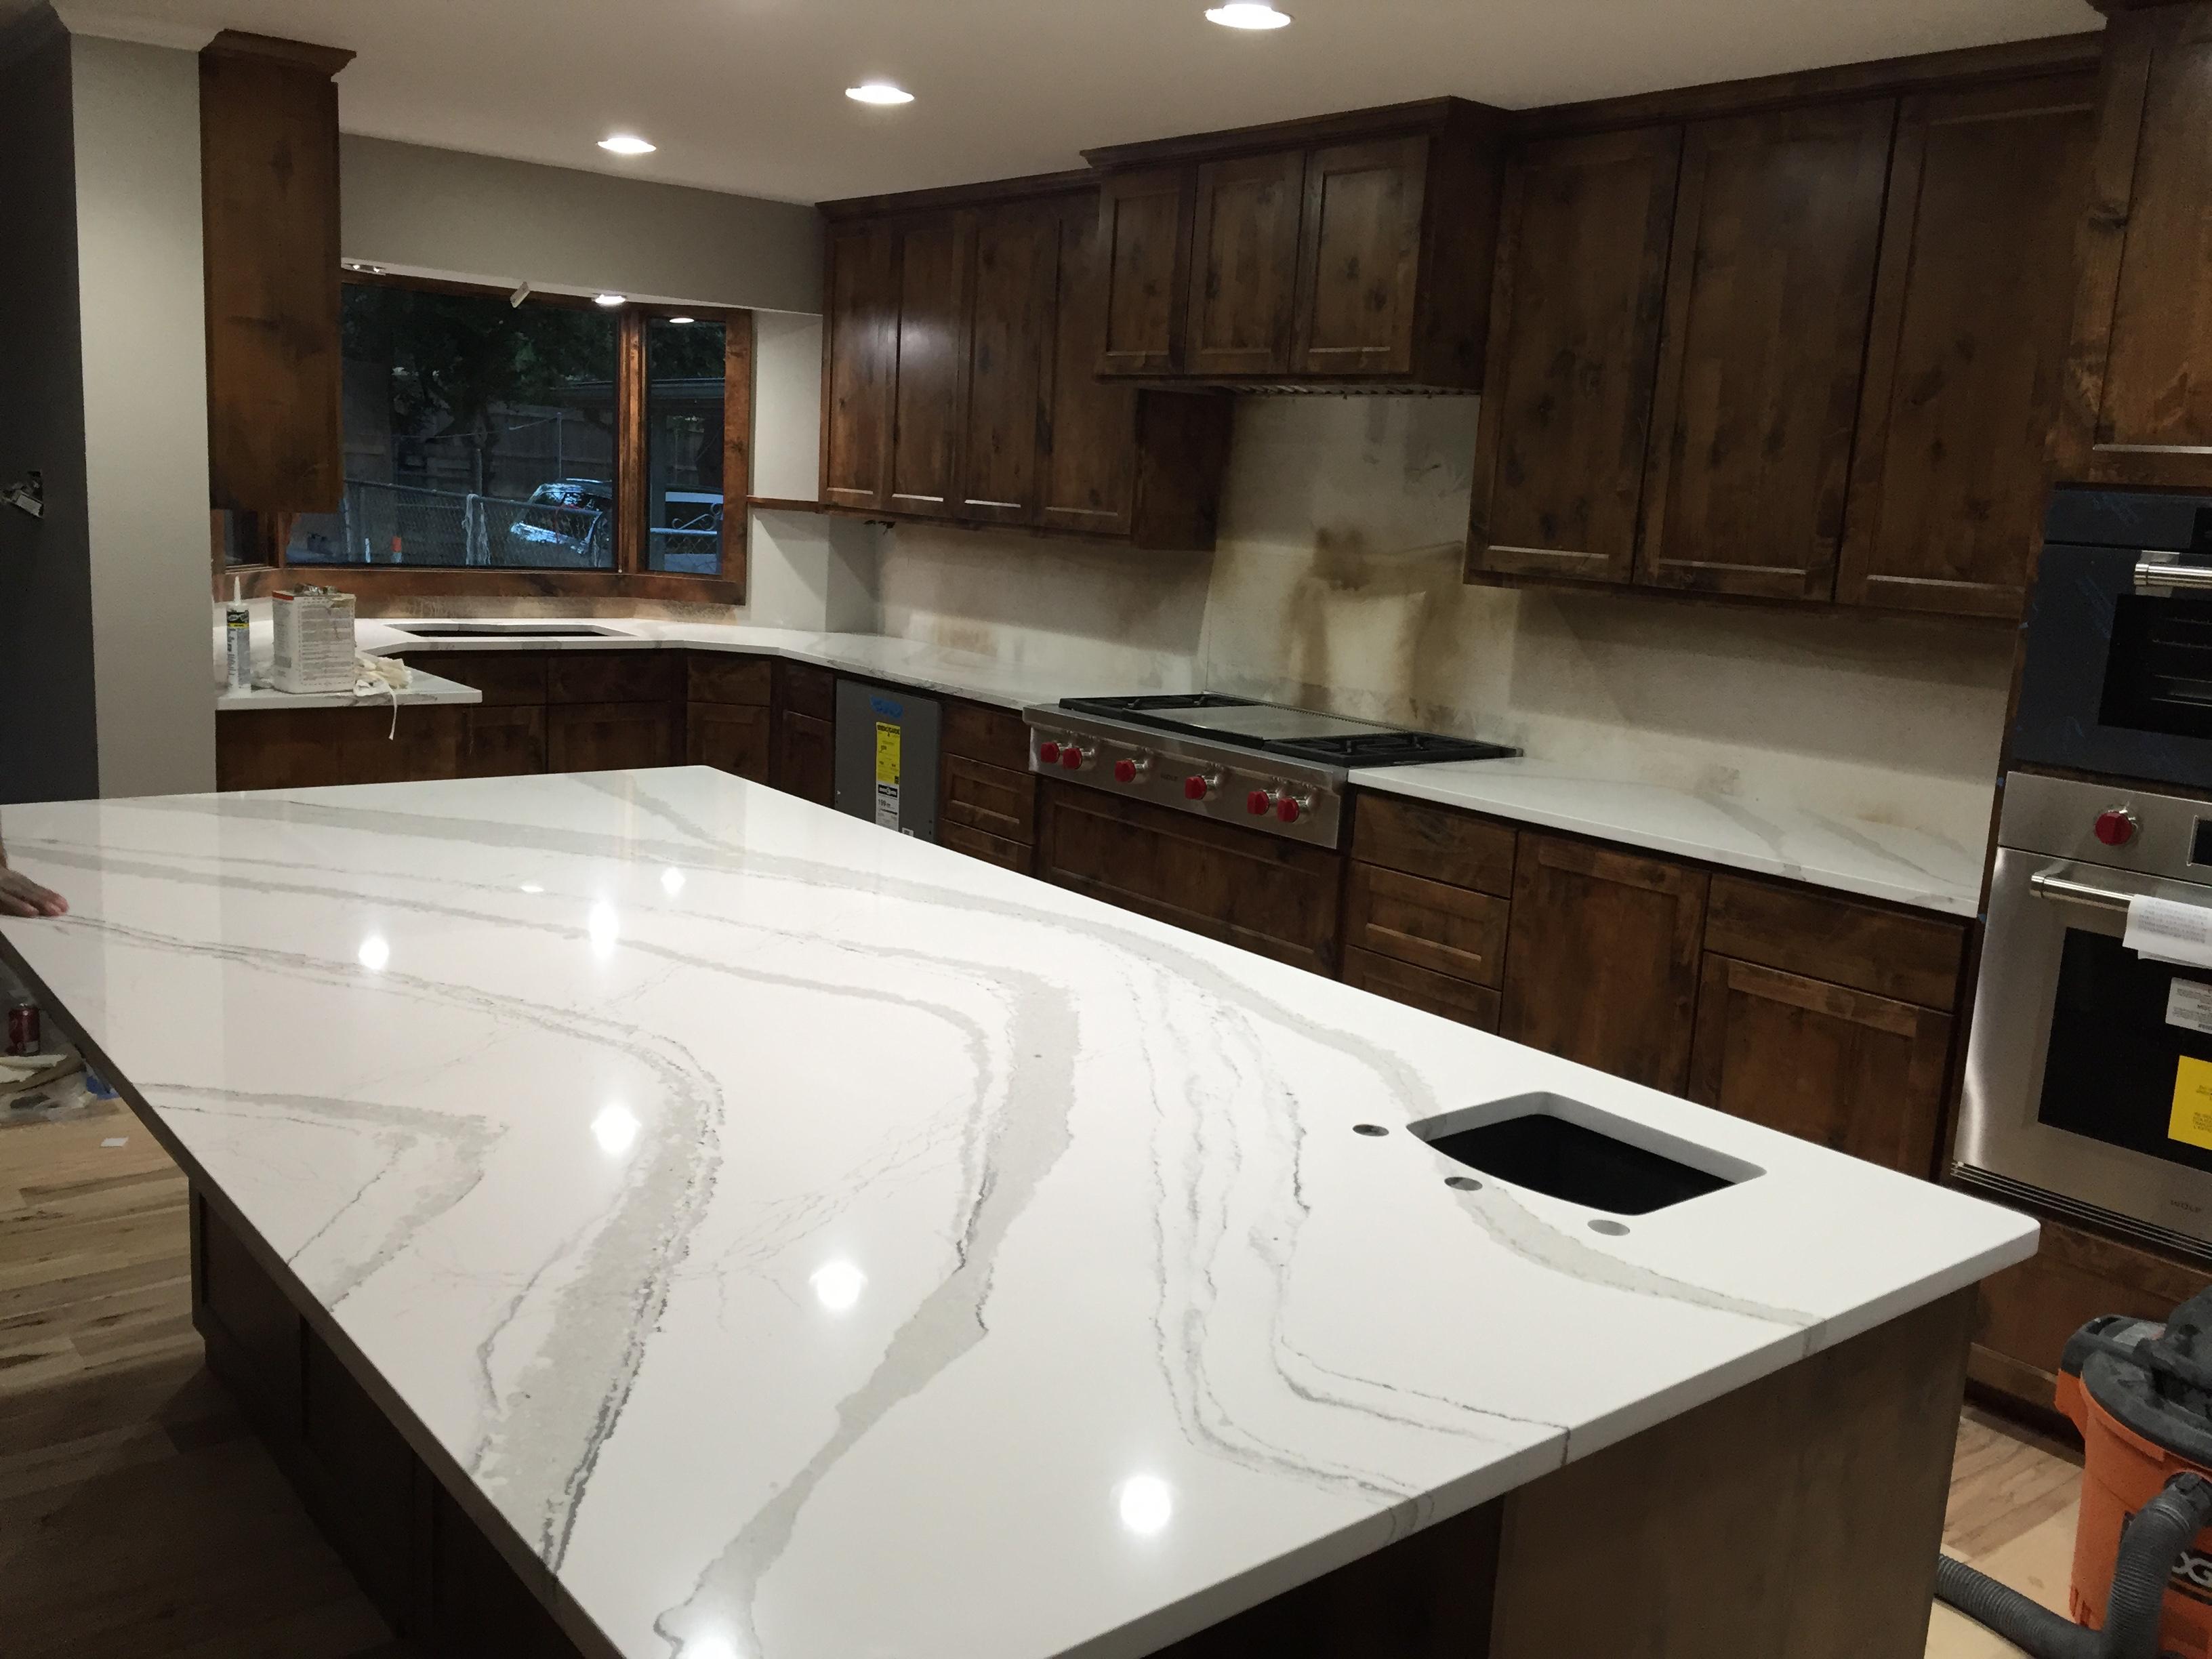 quartz residence dallas countertop spw greenwood brittanicca countertops texas cambria surfaces